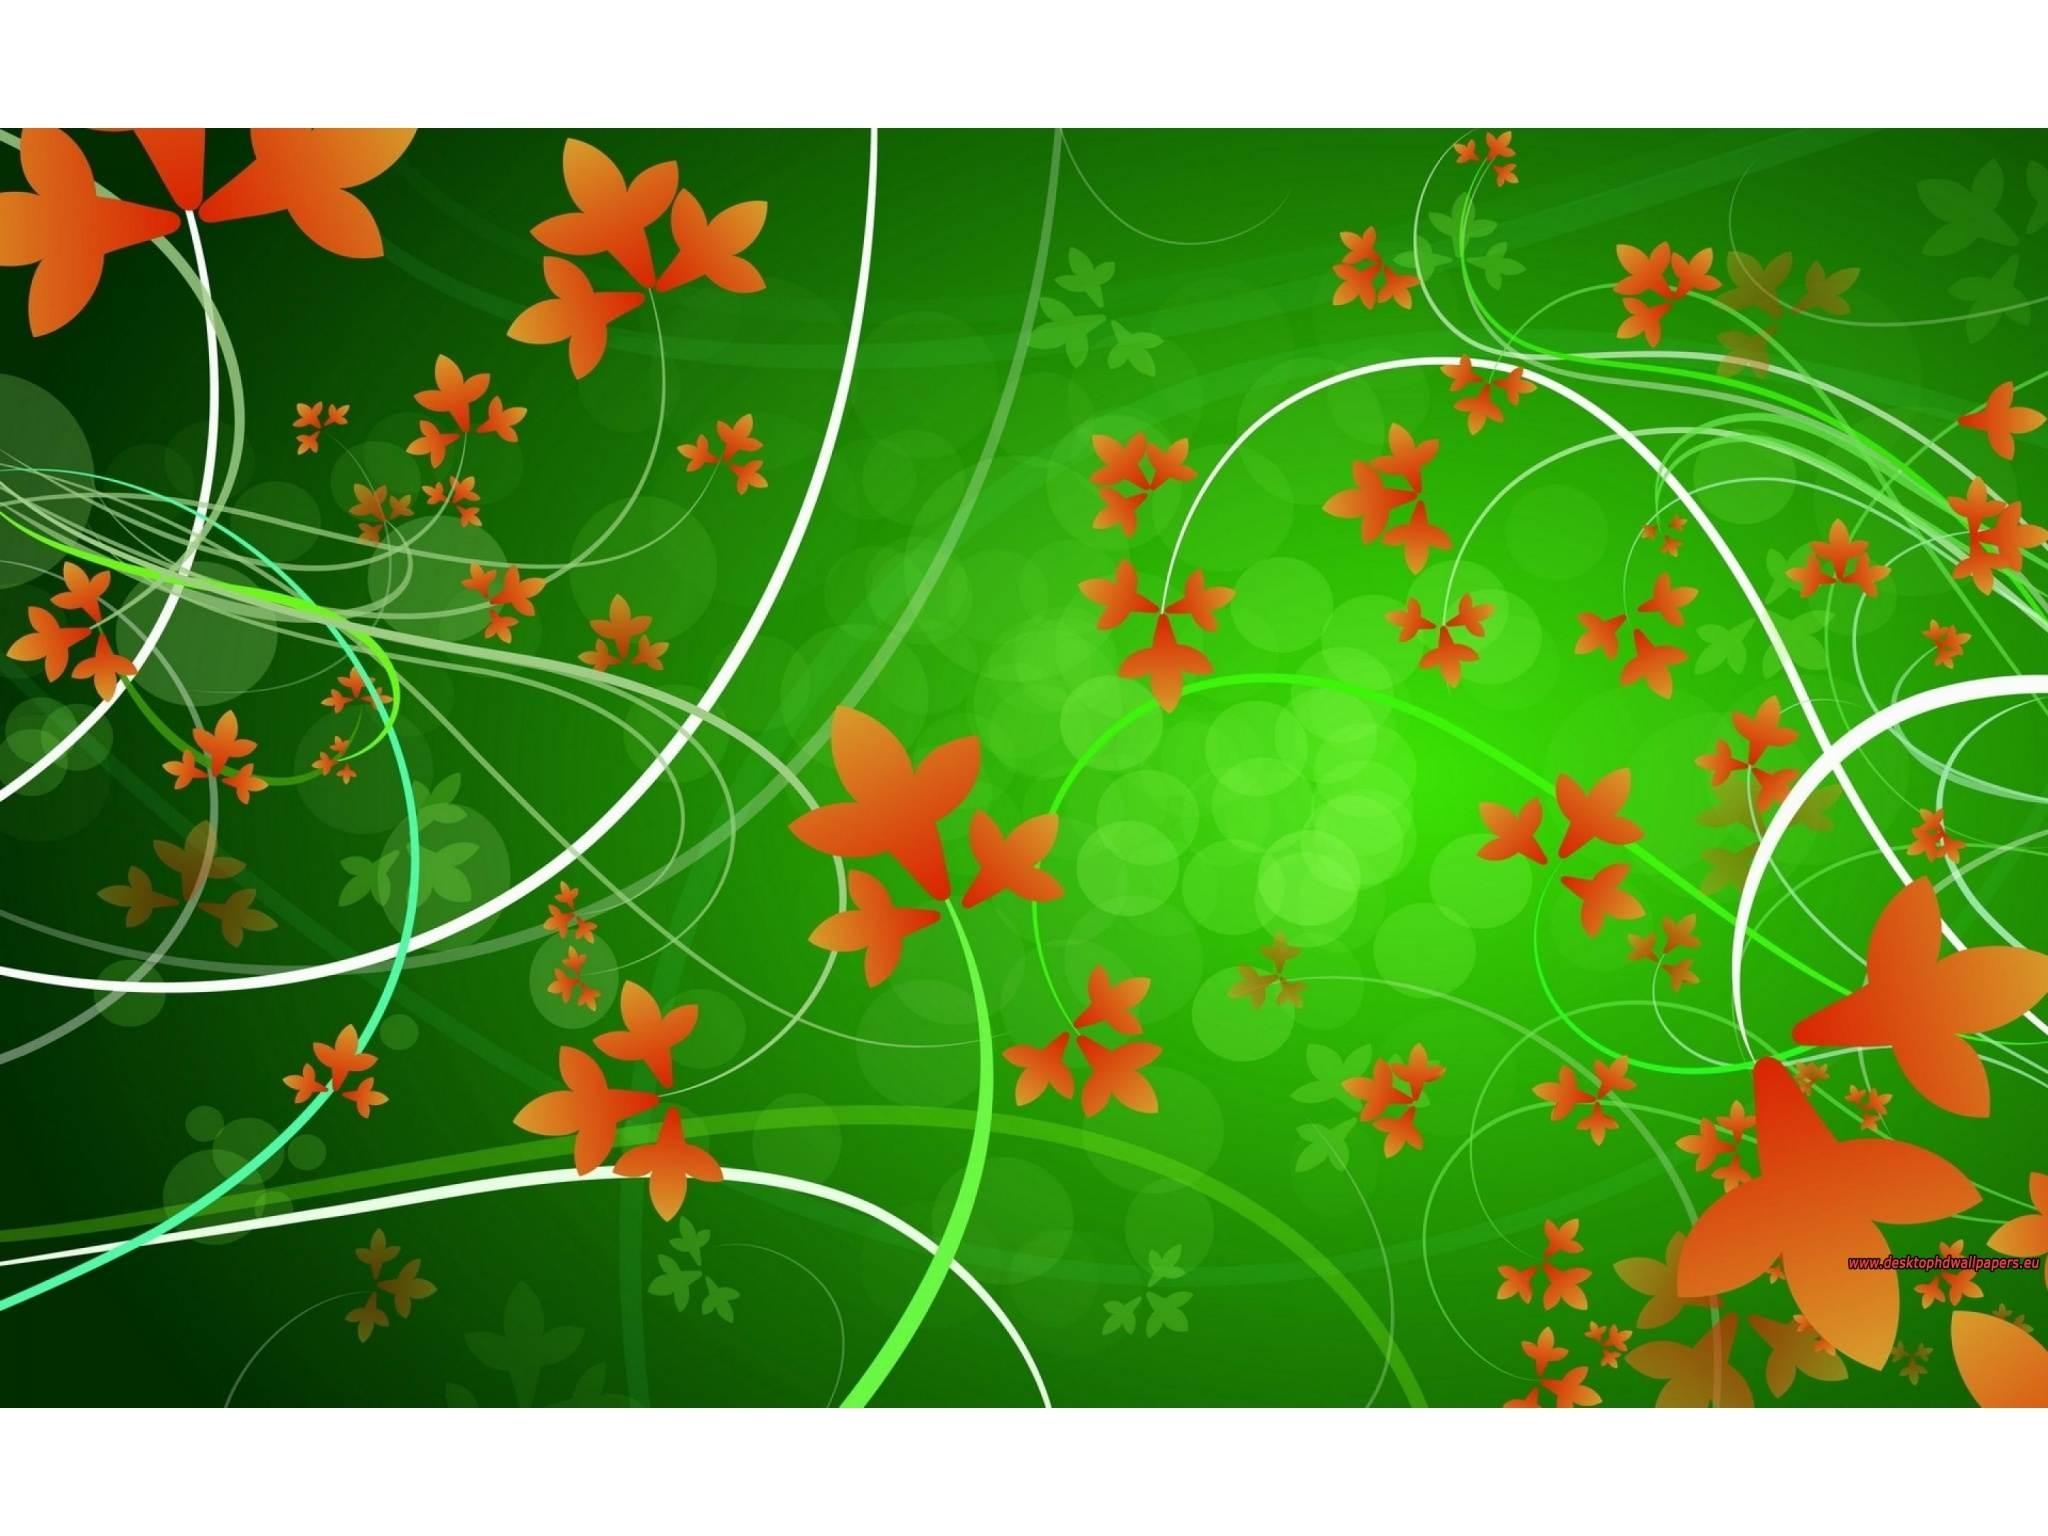 Wallpapers Backgrounds   Orange Flowers Wallpaper 2048x1536 Resolution 2048x1536